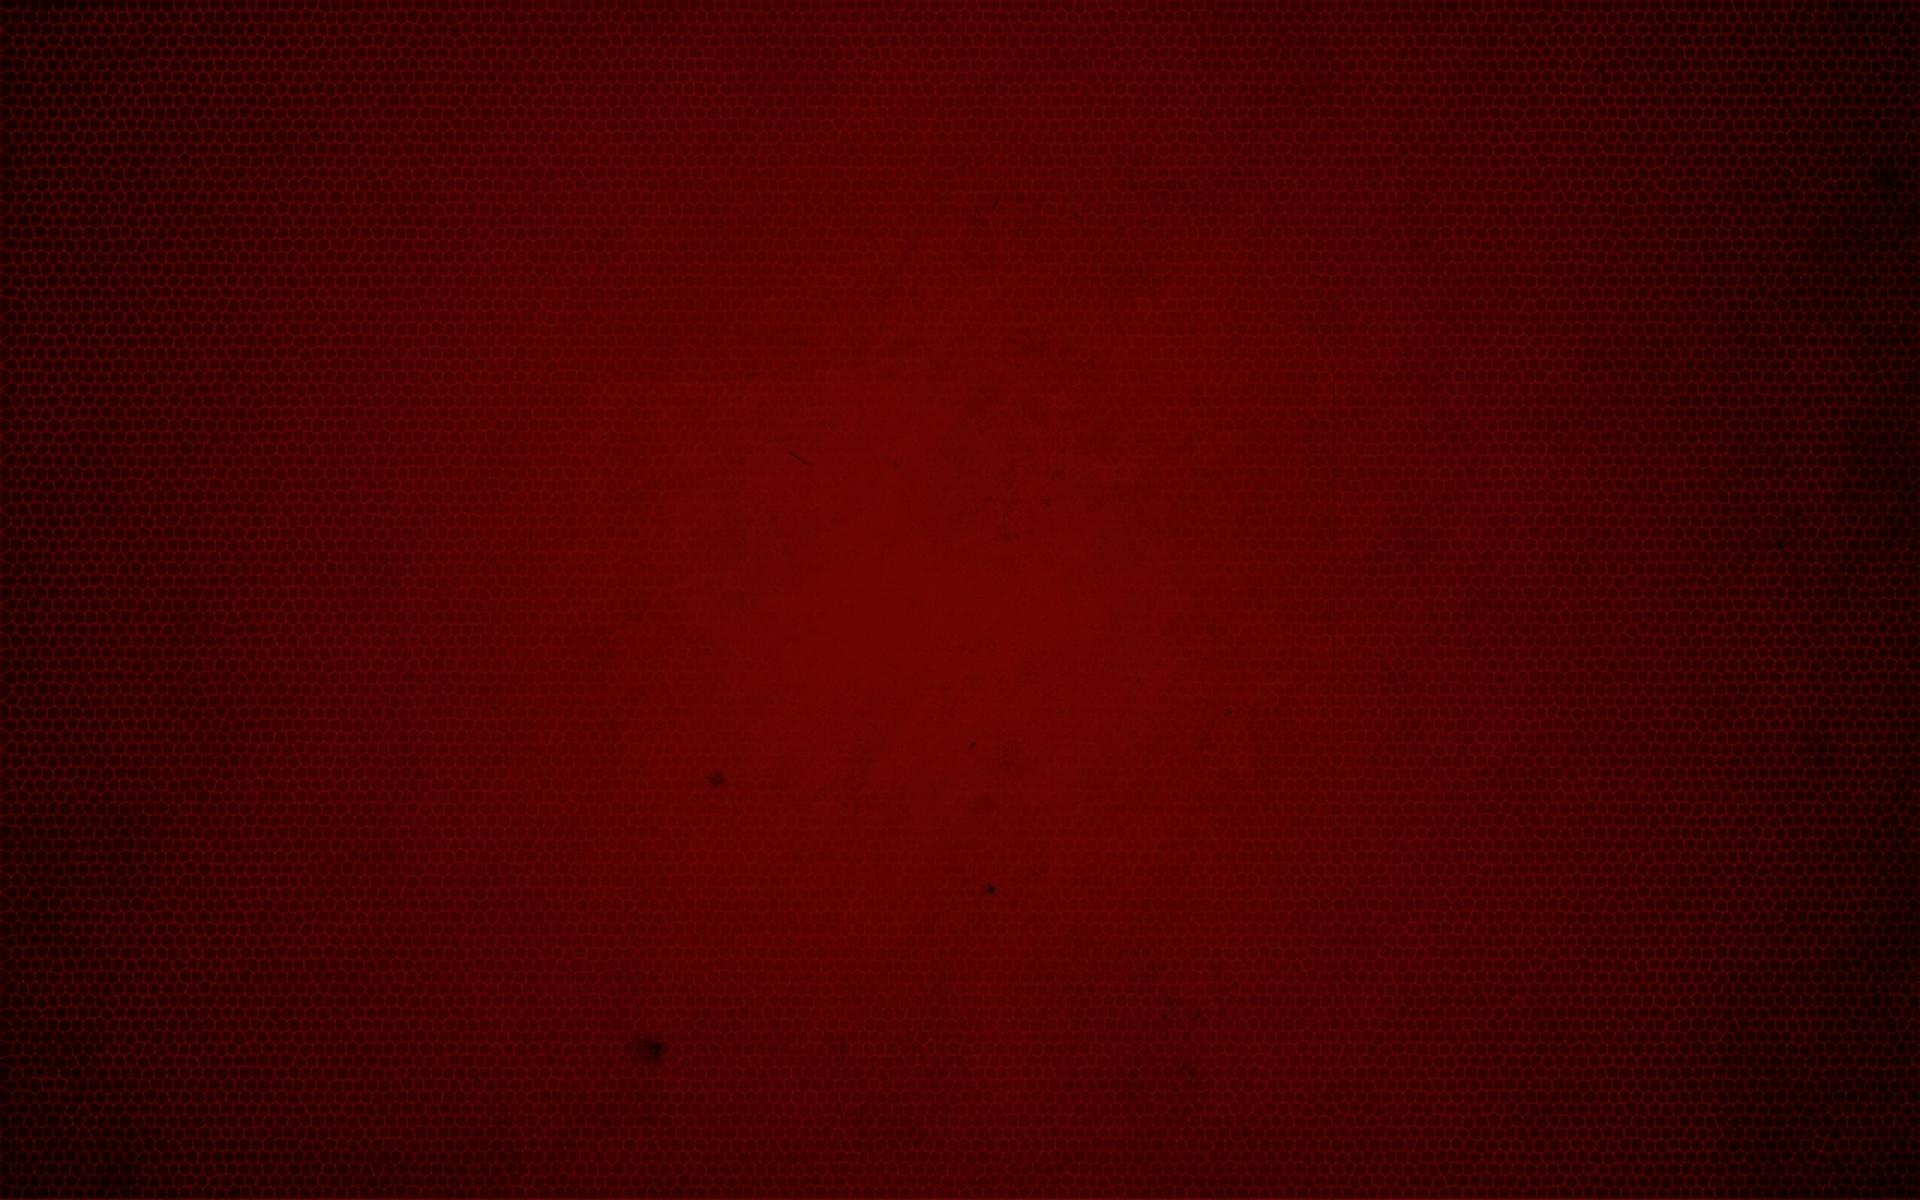 maroon color iphone wallpaper